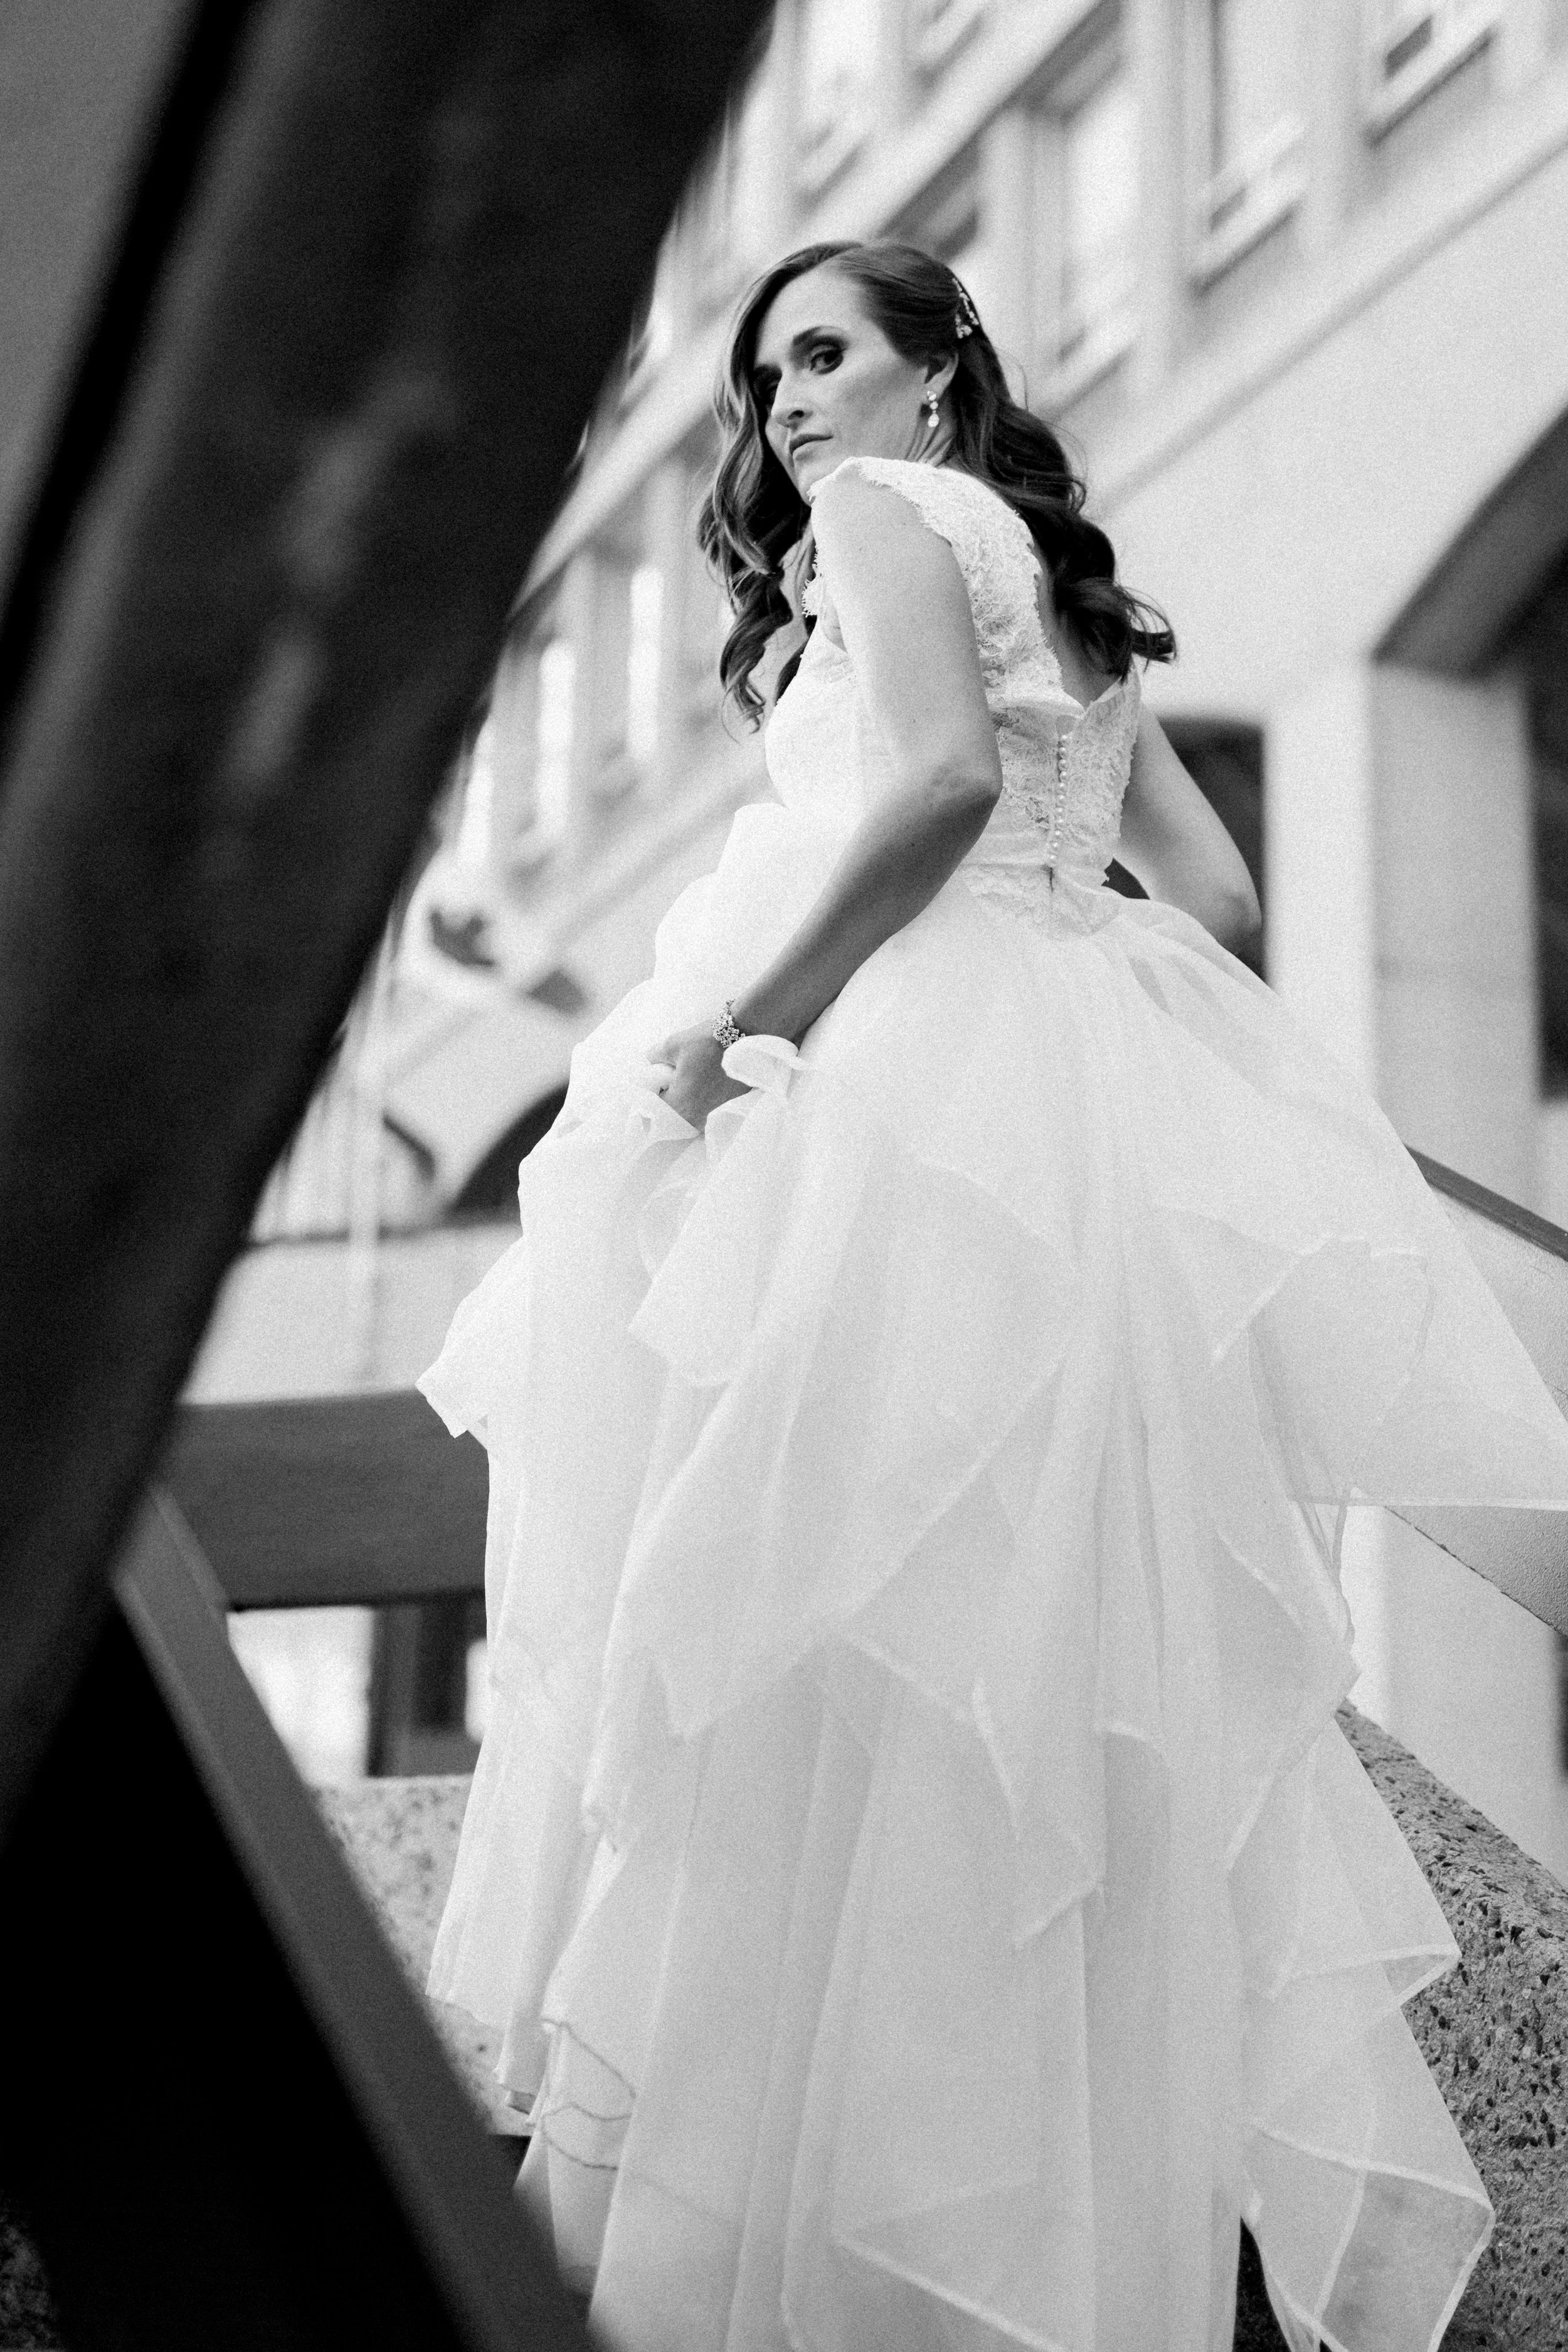 Toronto Fine Art Photographer - Yorkville Wedding - Bride & Groom Portraits-53.jpg